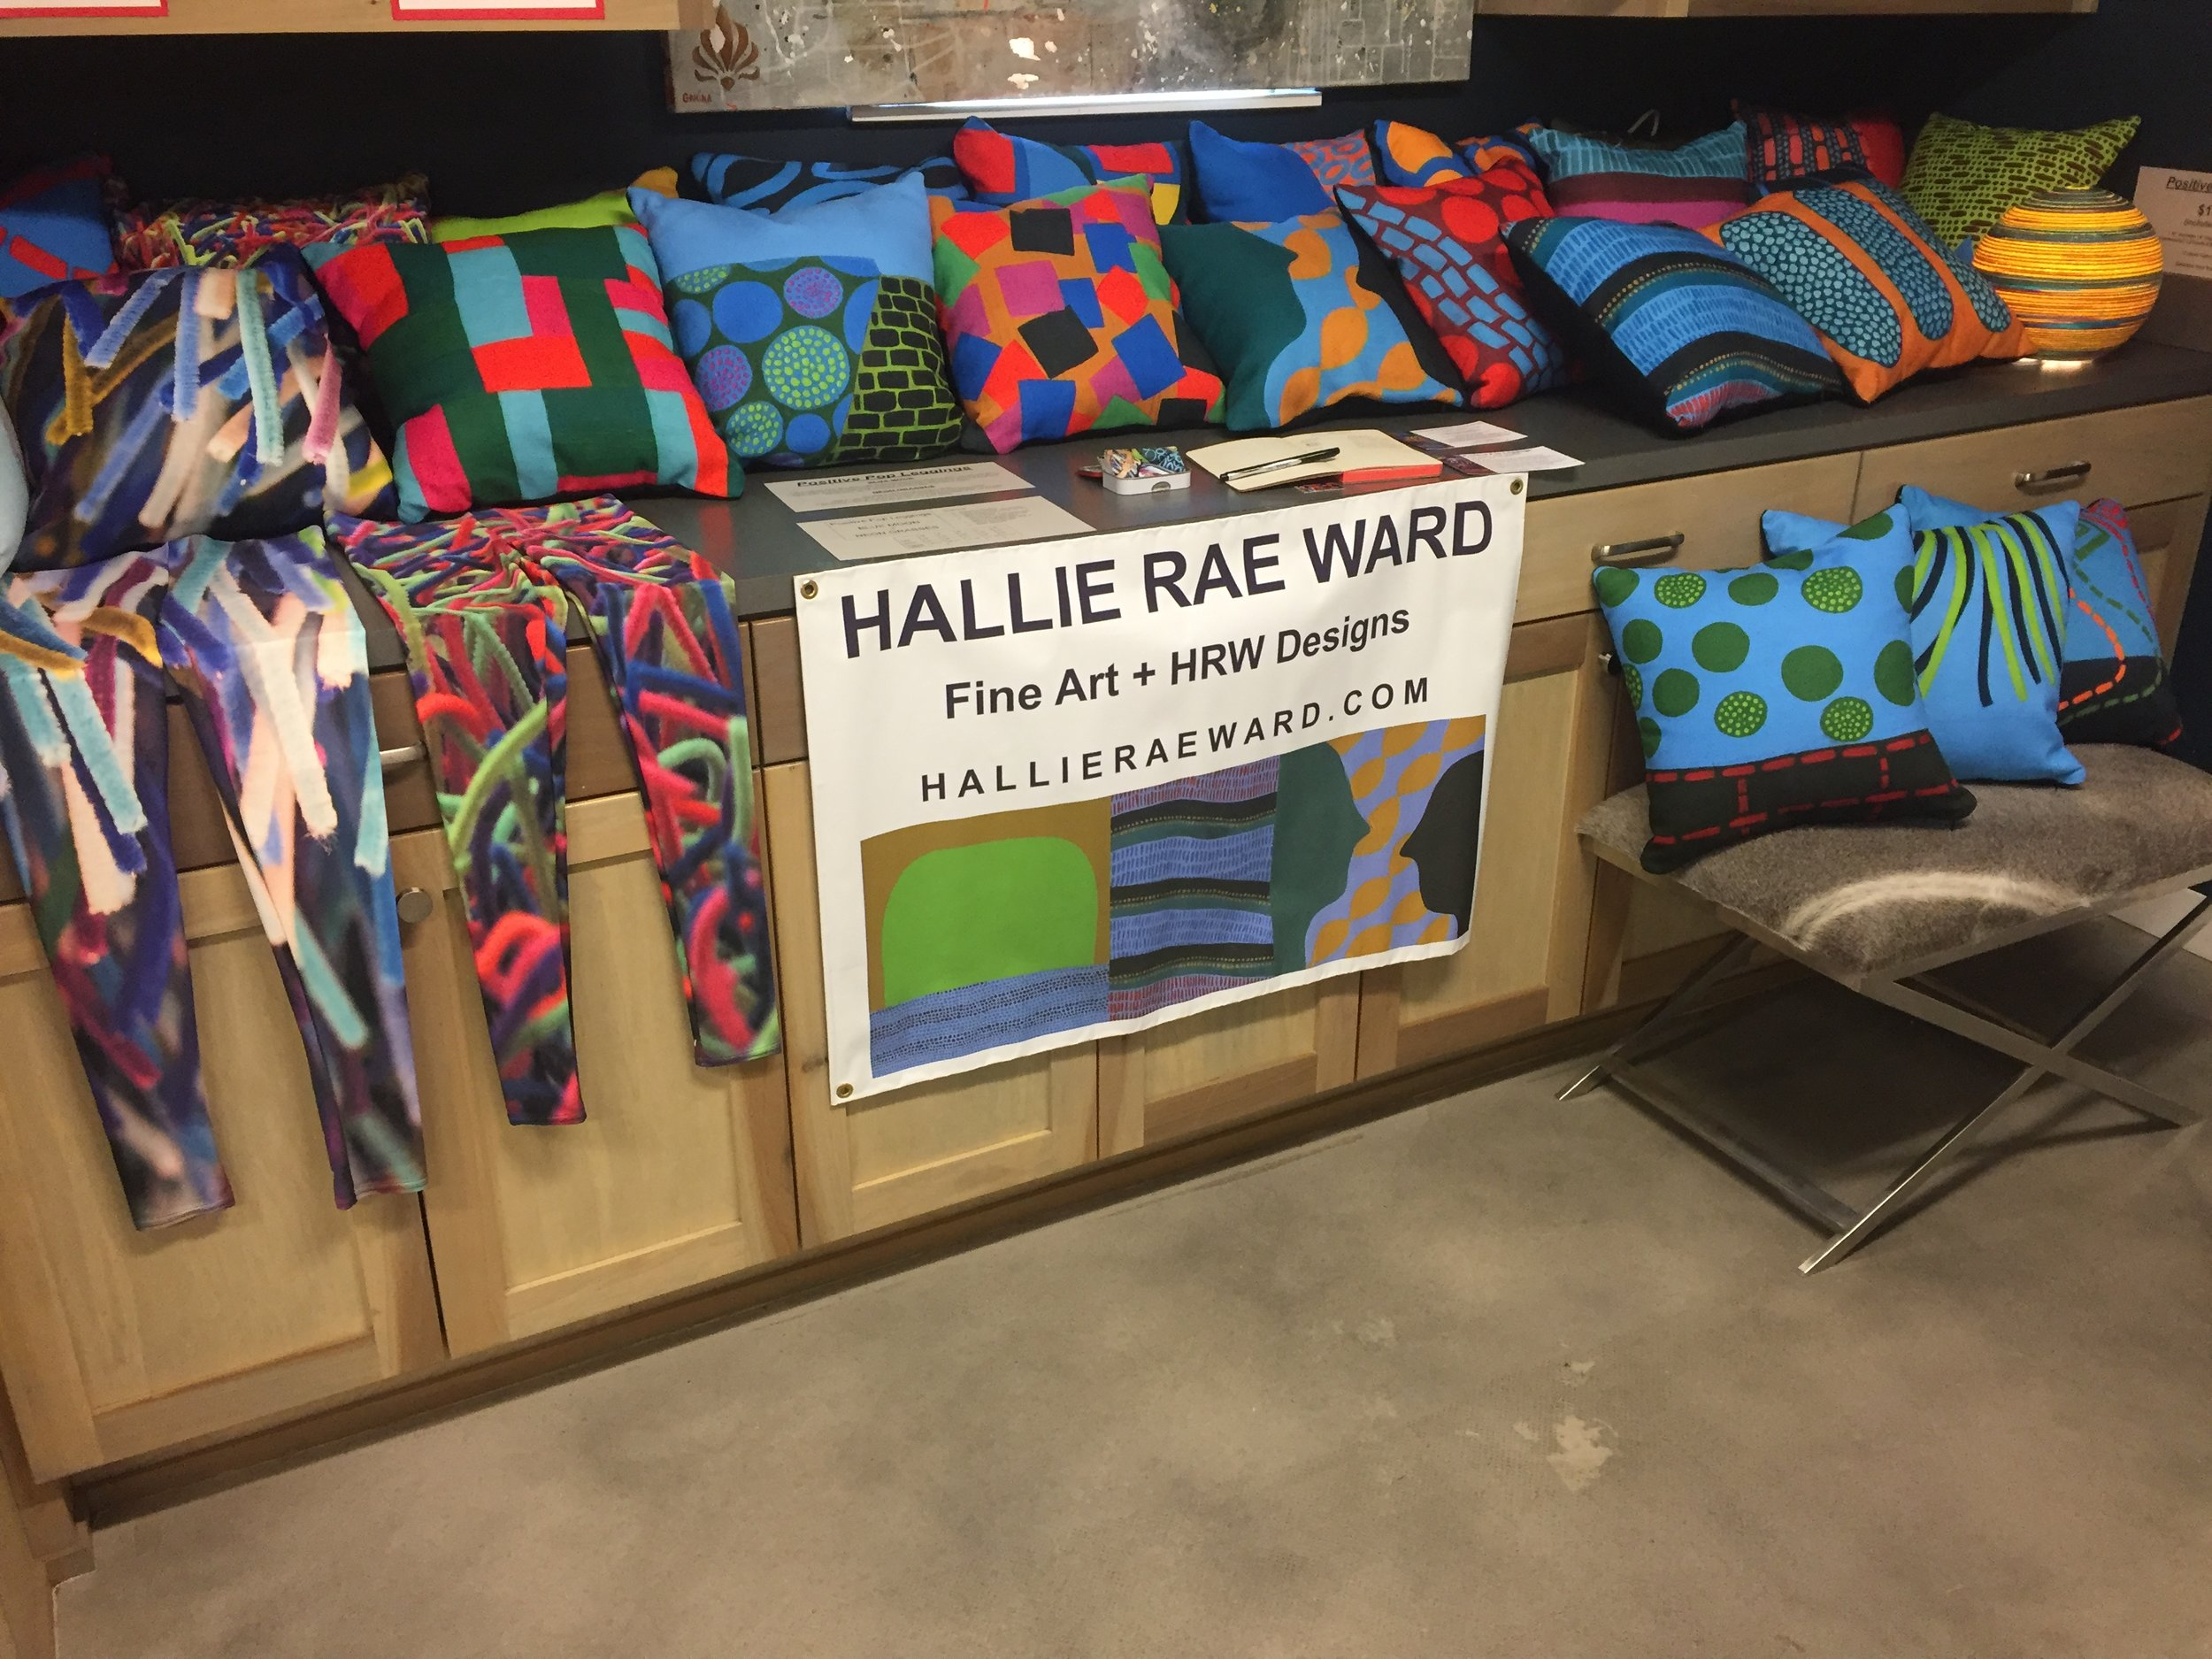 WEST 2017 Hallie rae Ward (2).JPG